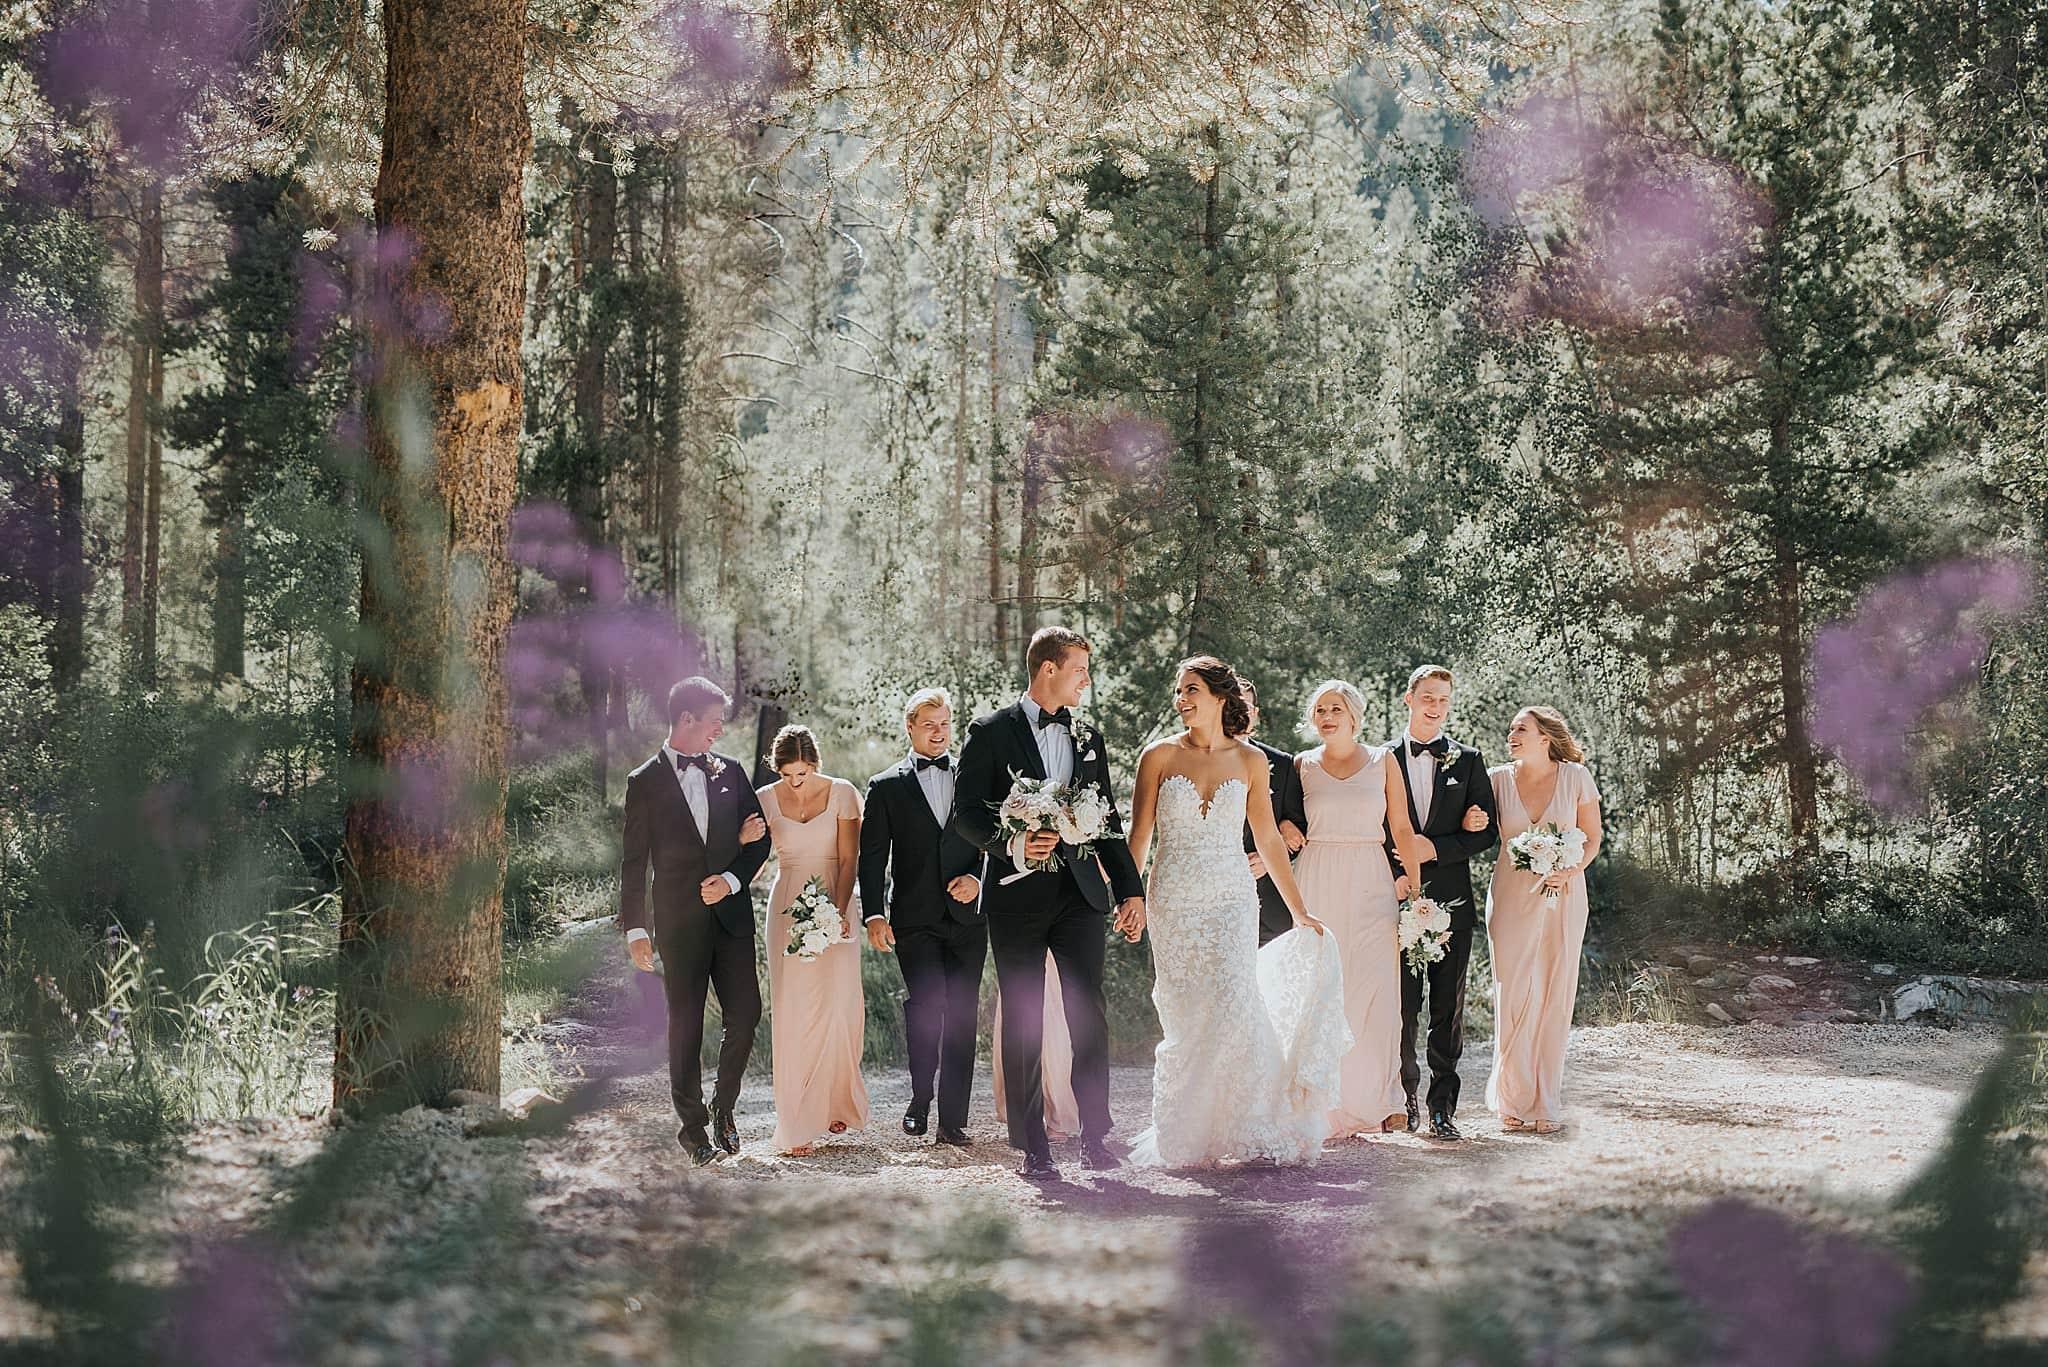 colorado wedding photographer, denver wedding photographer, best colorado wedding photographer, top colorado wedding photographer, jill houser photography